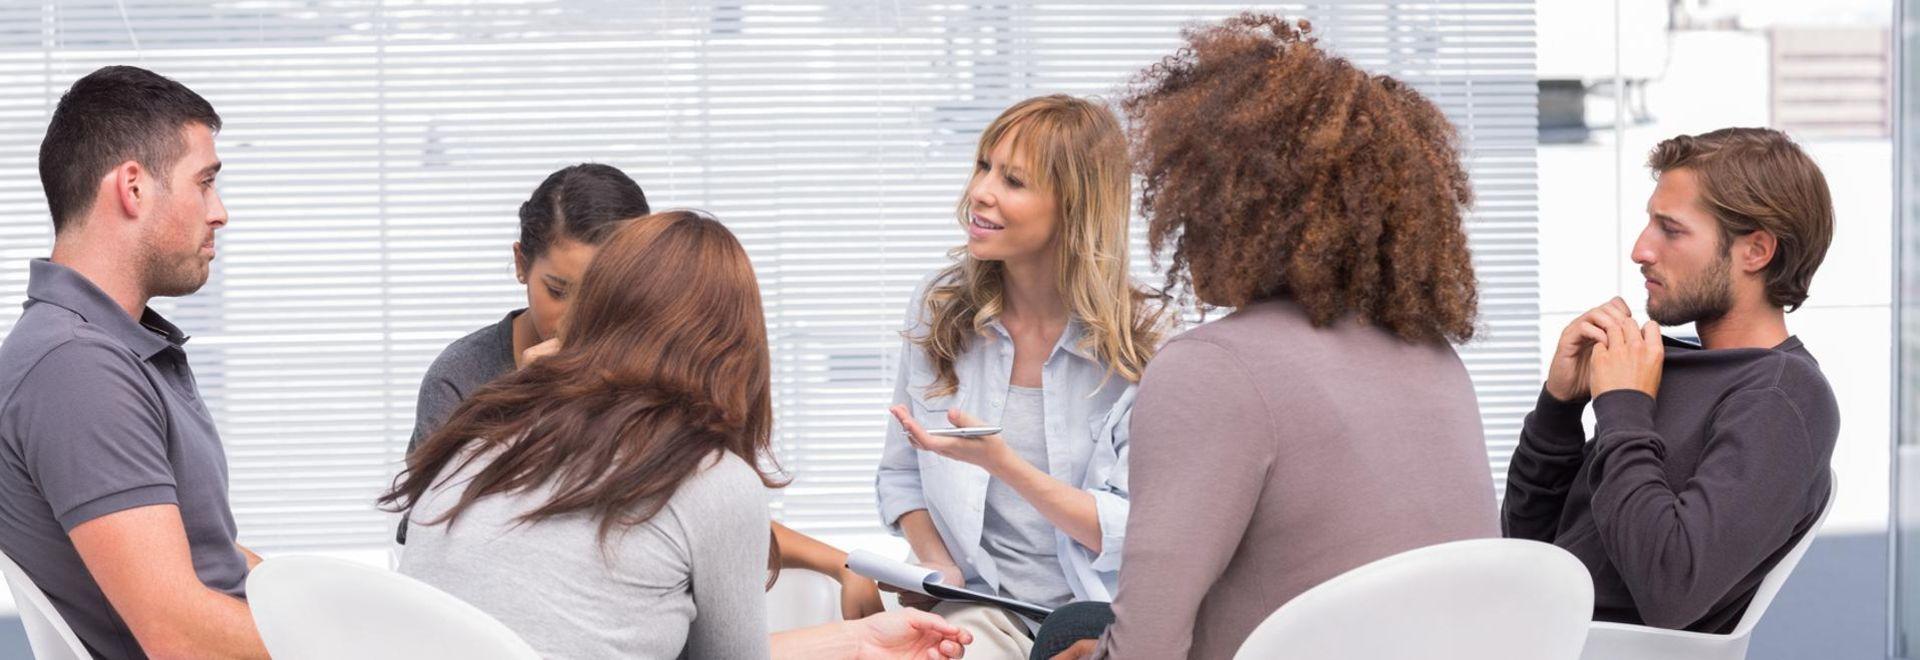 Gruppentherapie in der Heilpraktikerpraxis